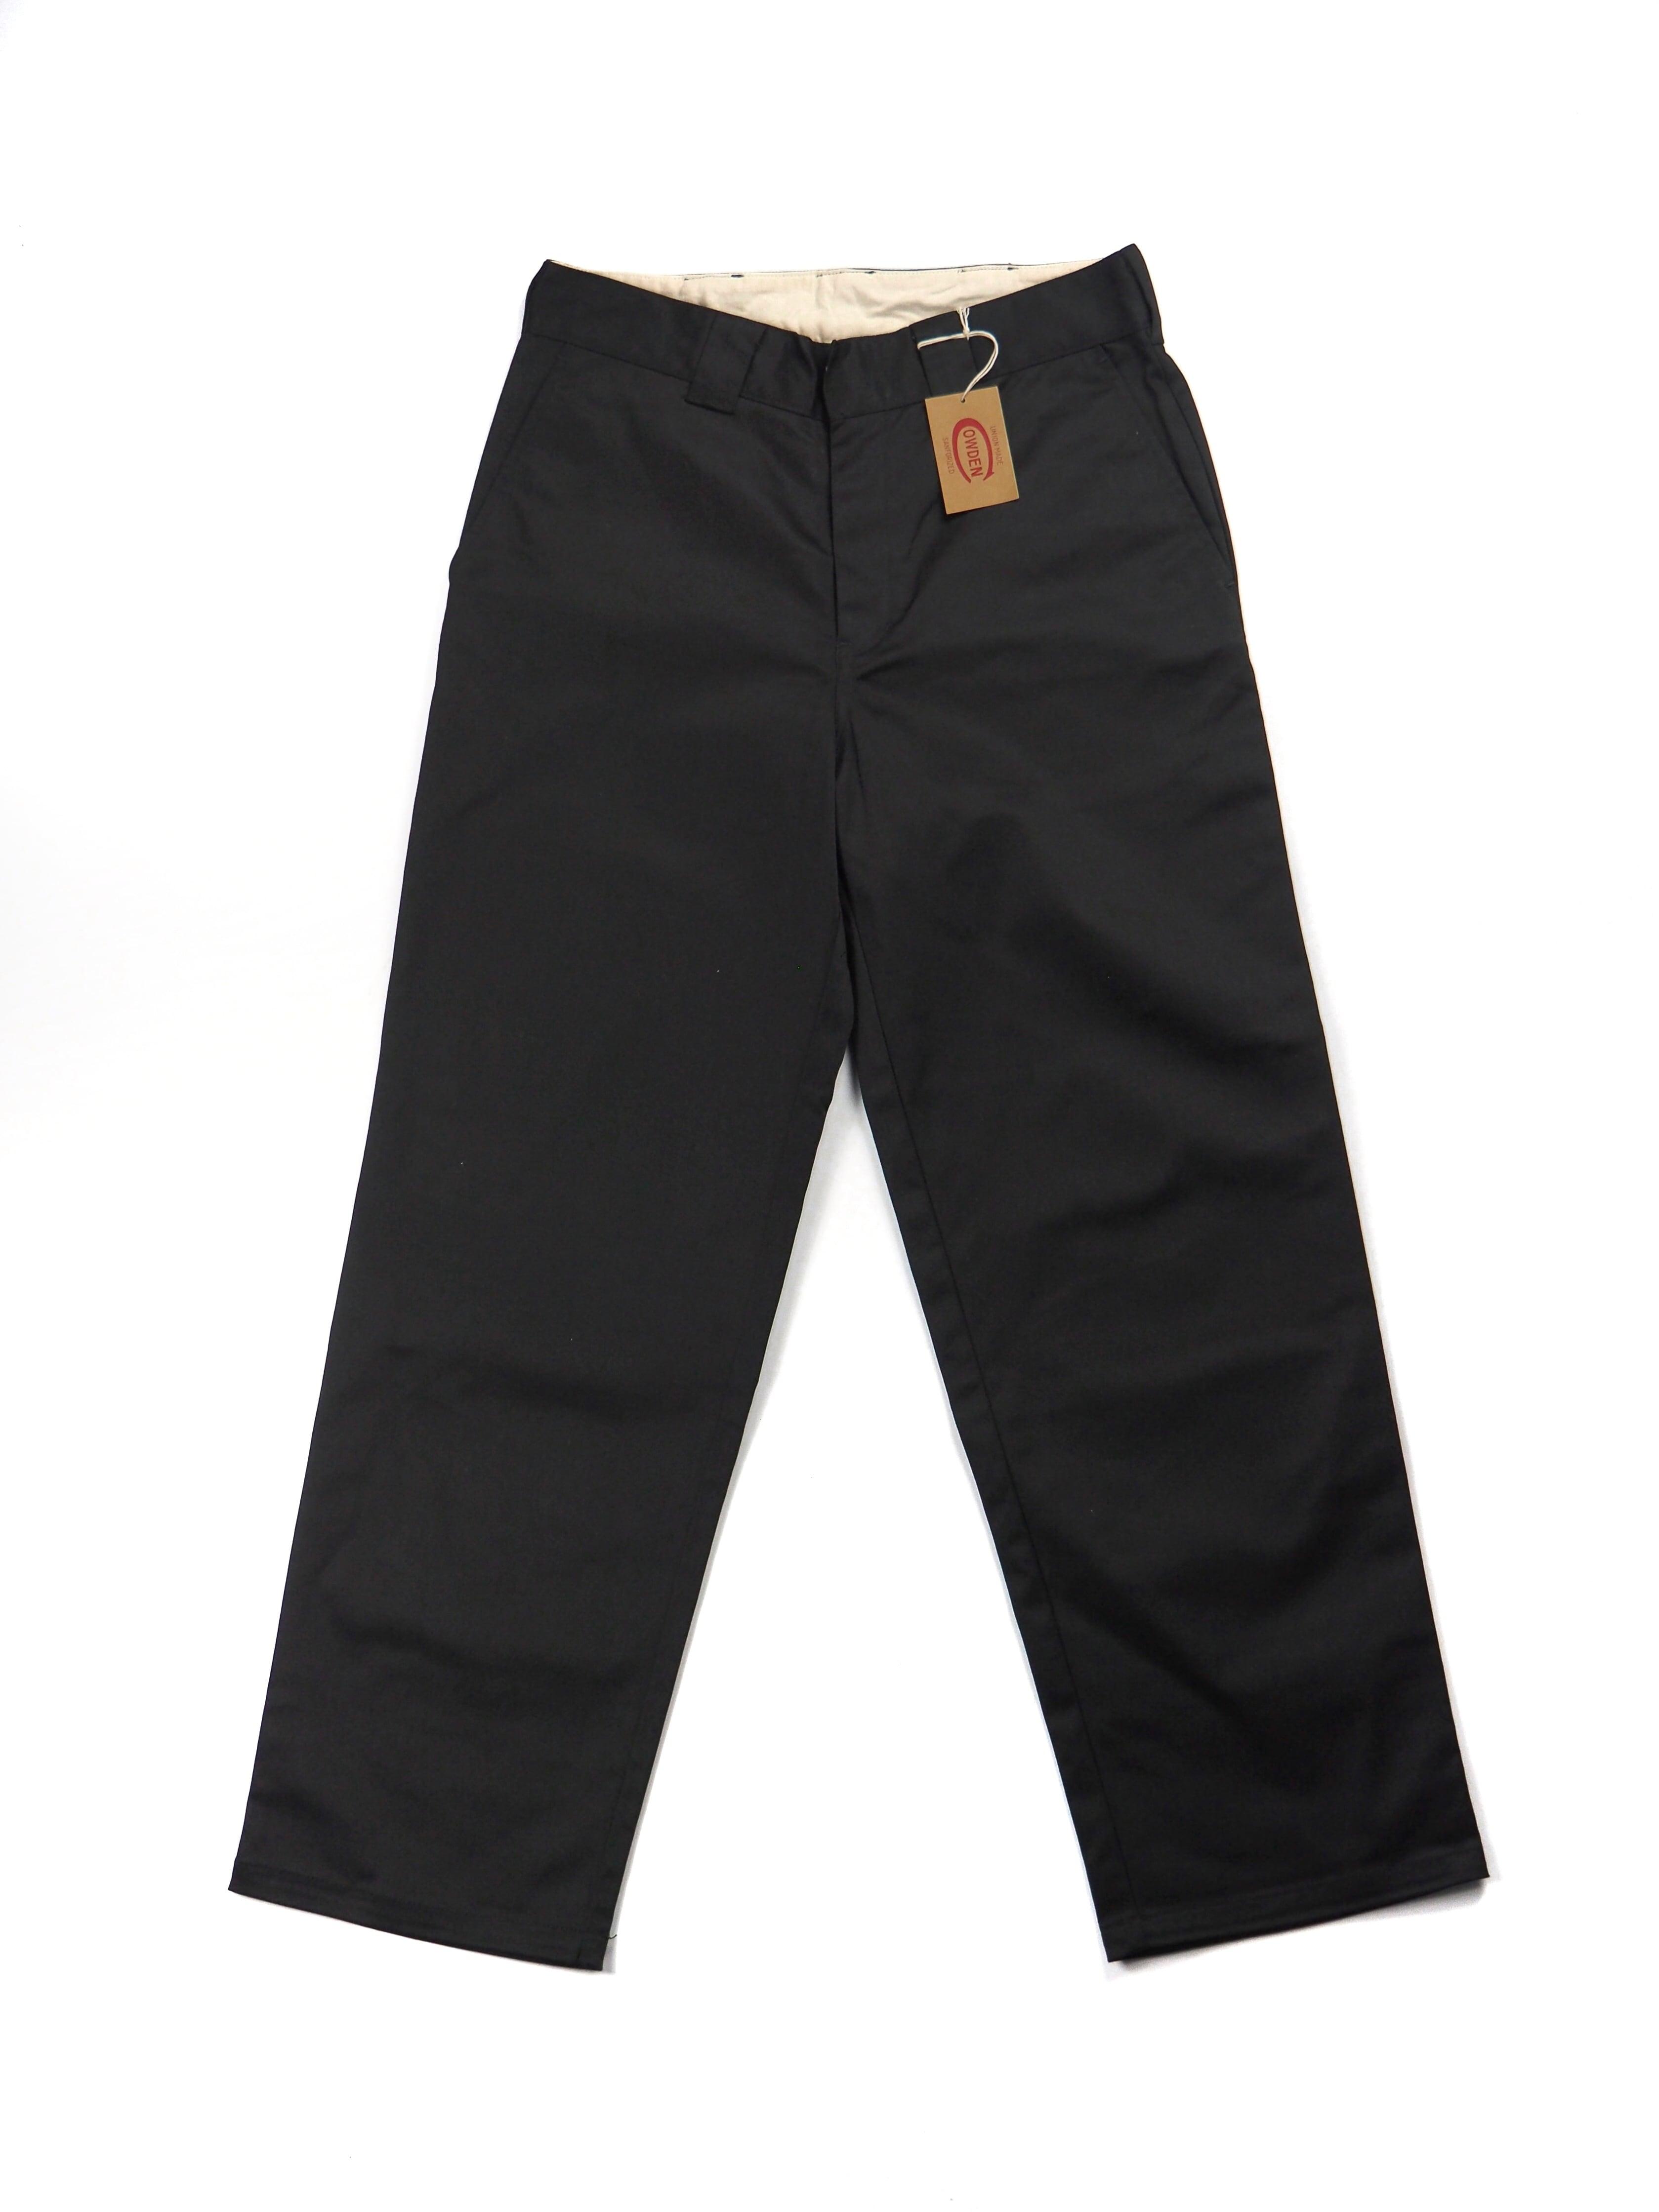 【COWDEN】REGULAR STRAIGHT PANTS